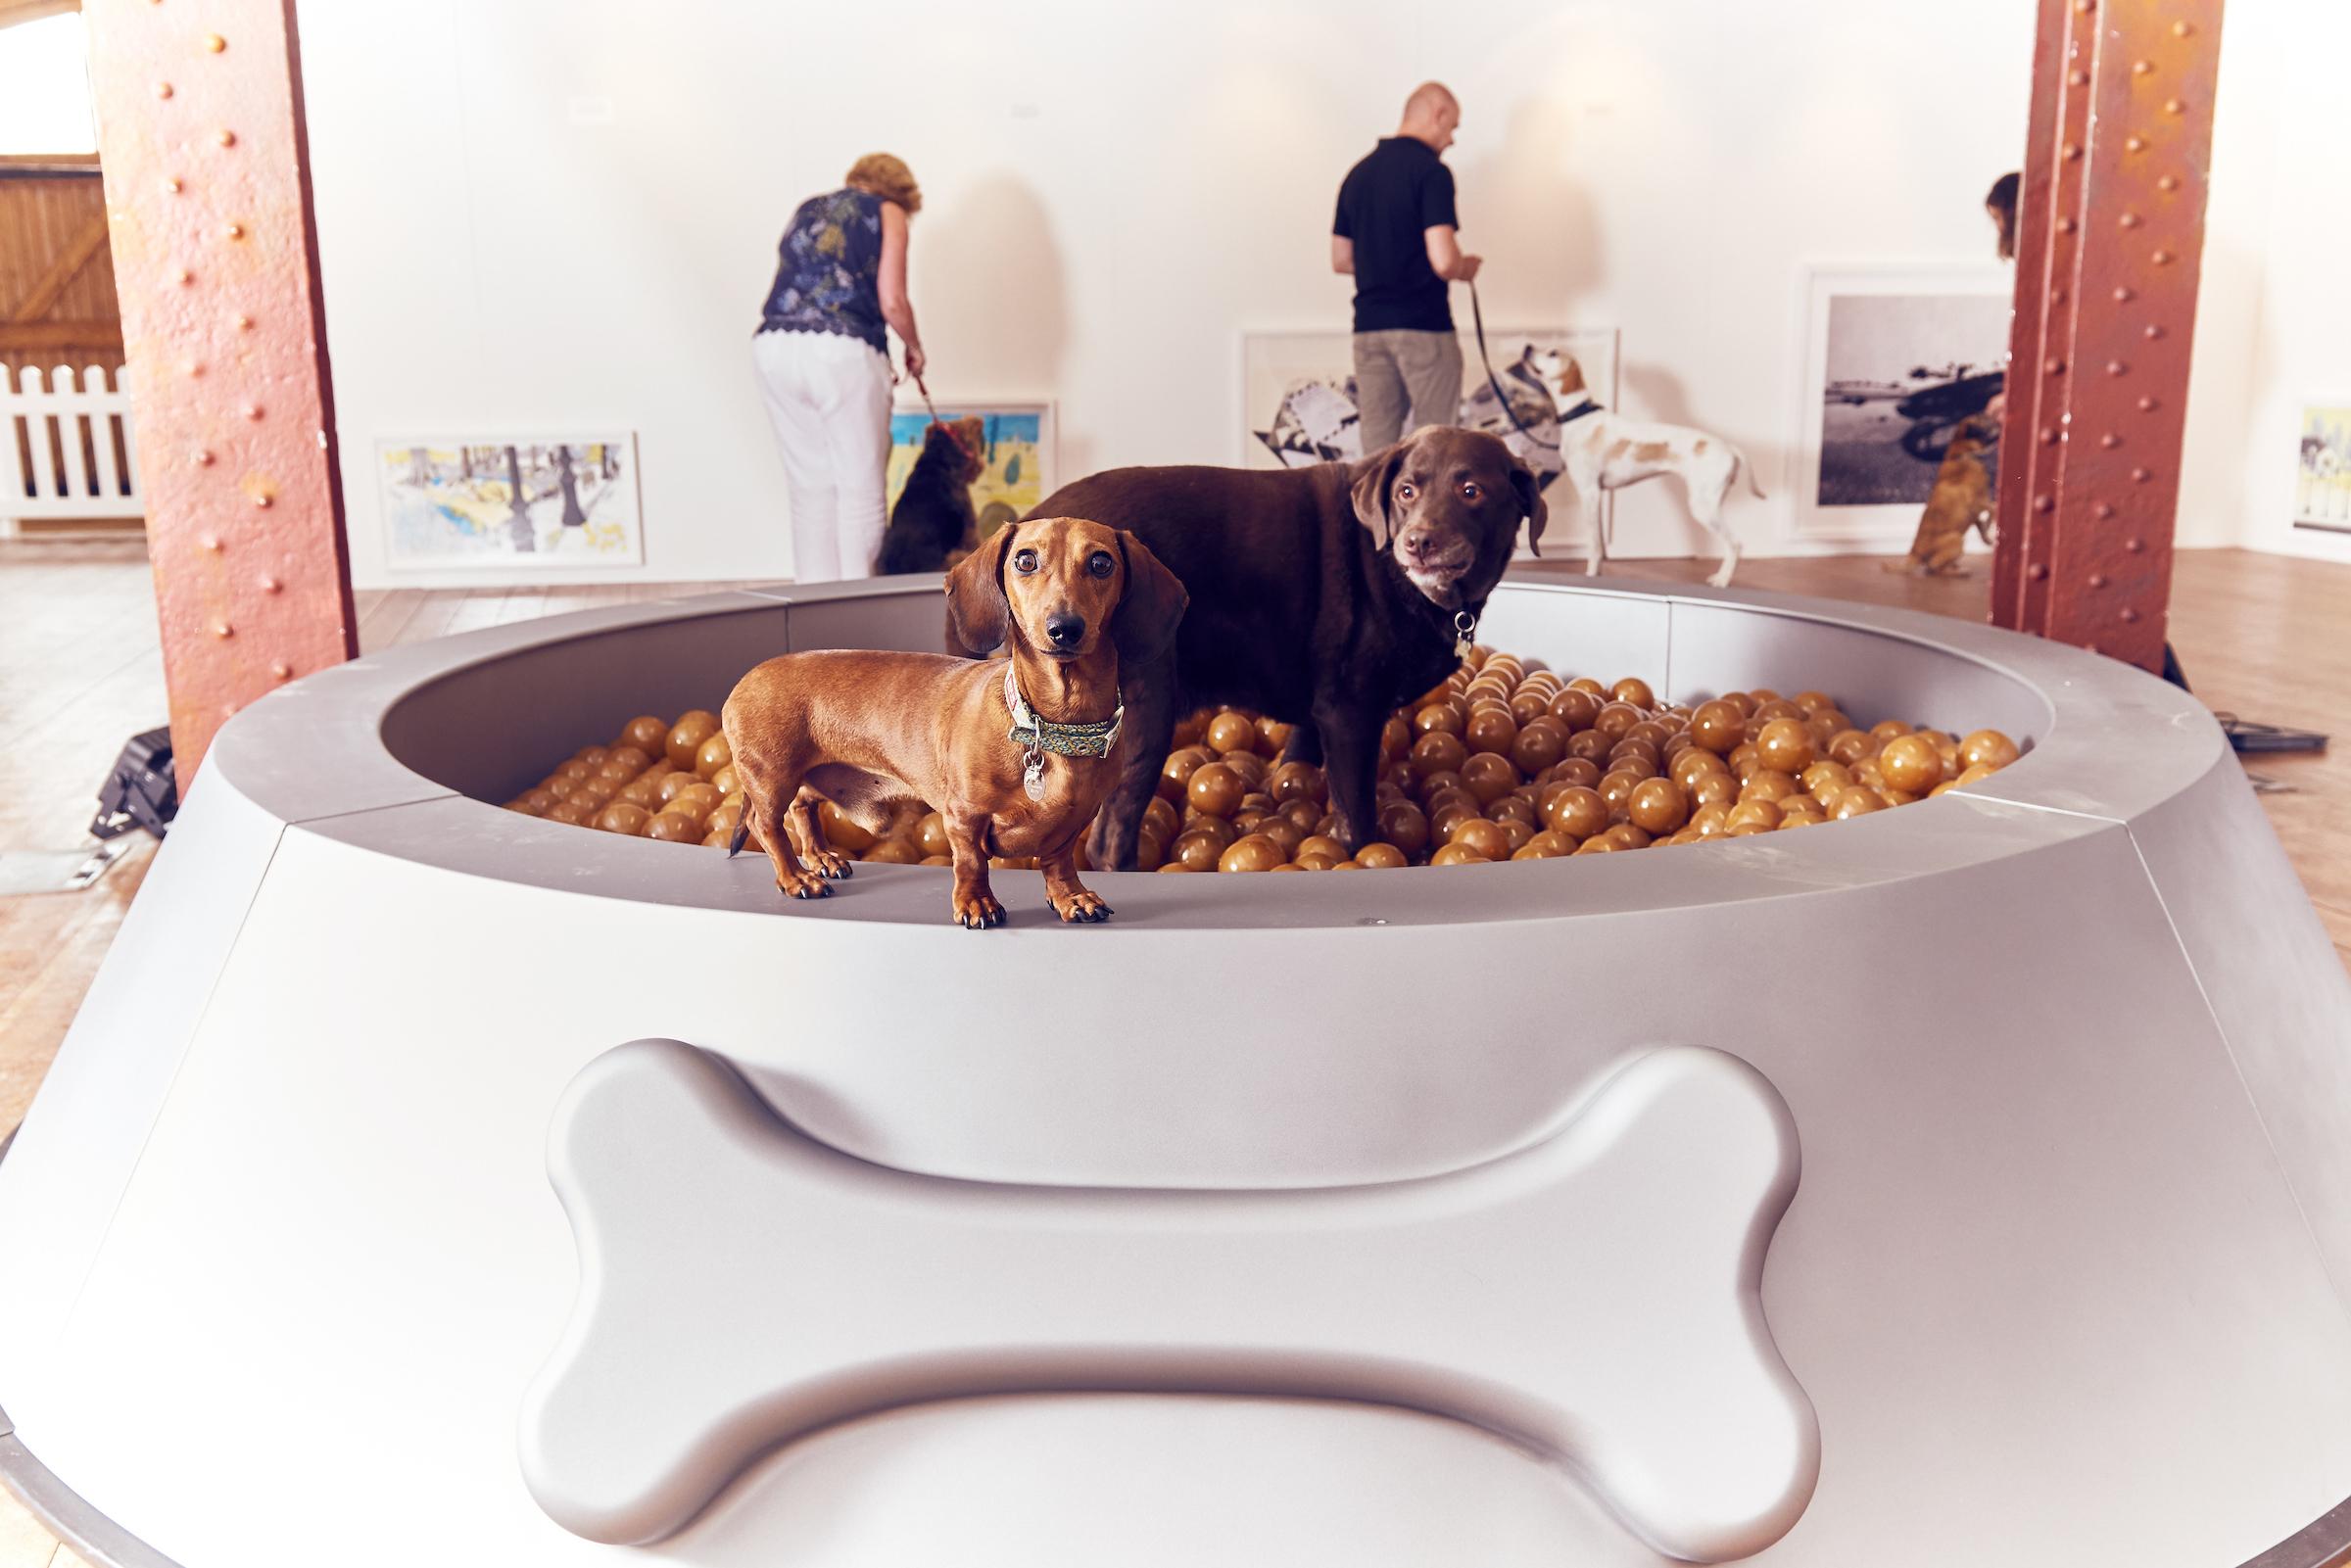 BUCK_Dogs_Exhibition-3.jpg